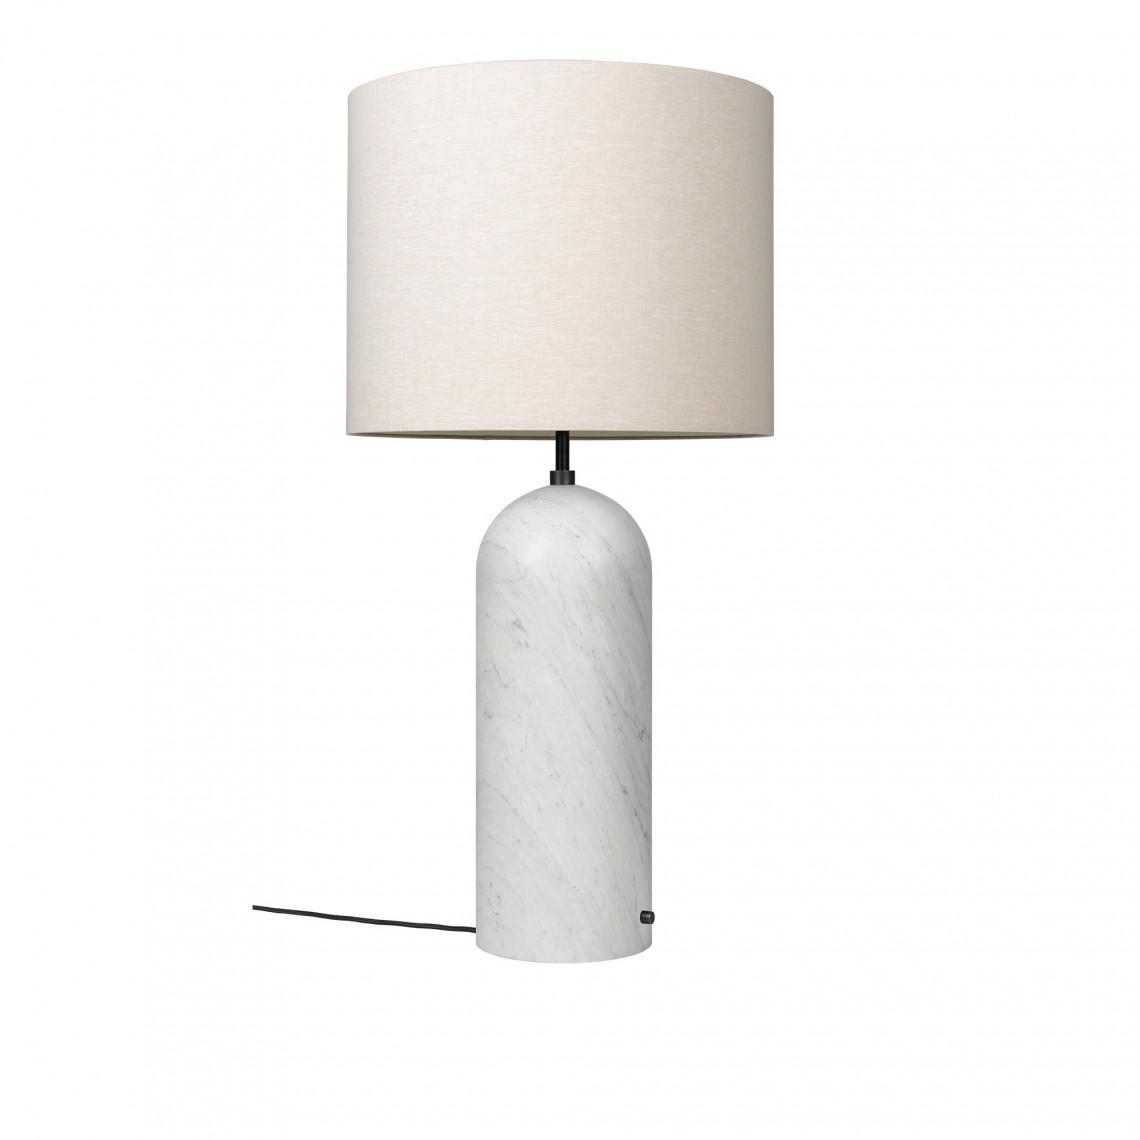 Gravity XL Low - Golvlampa Vit marmor